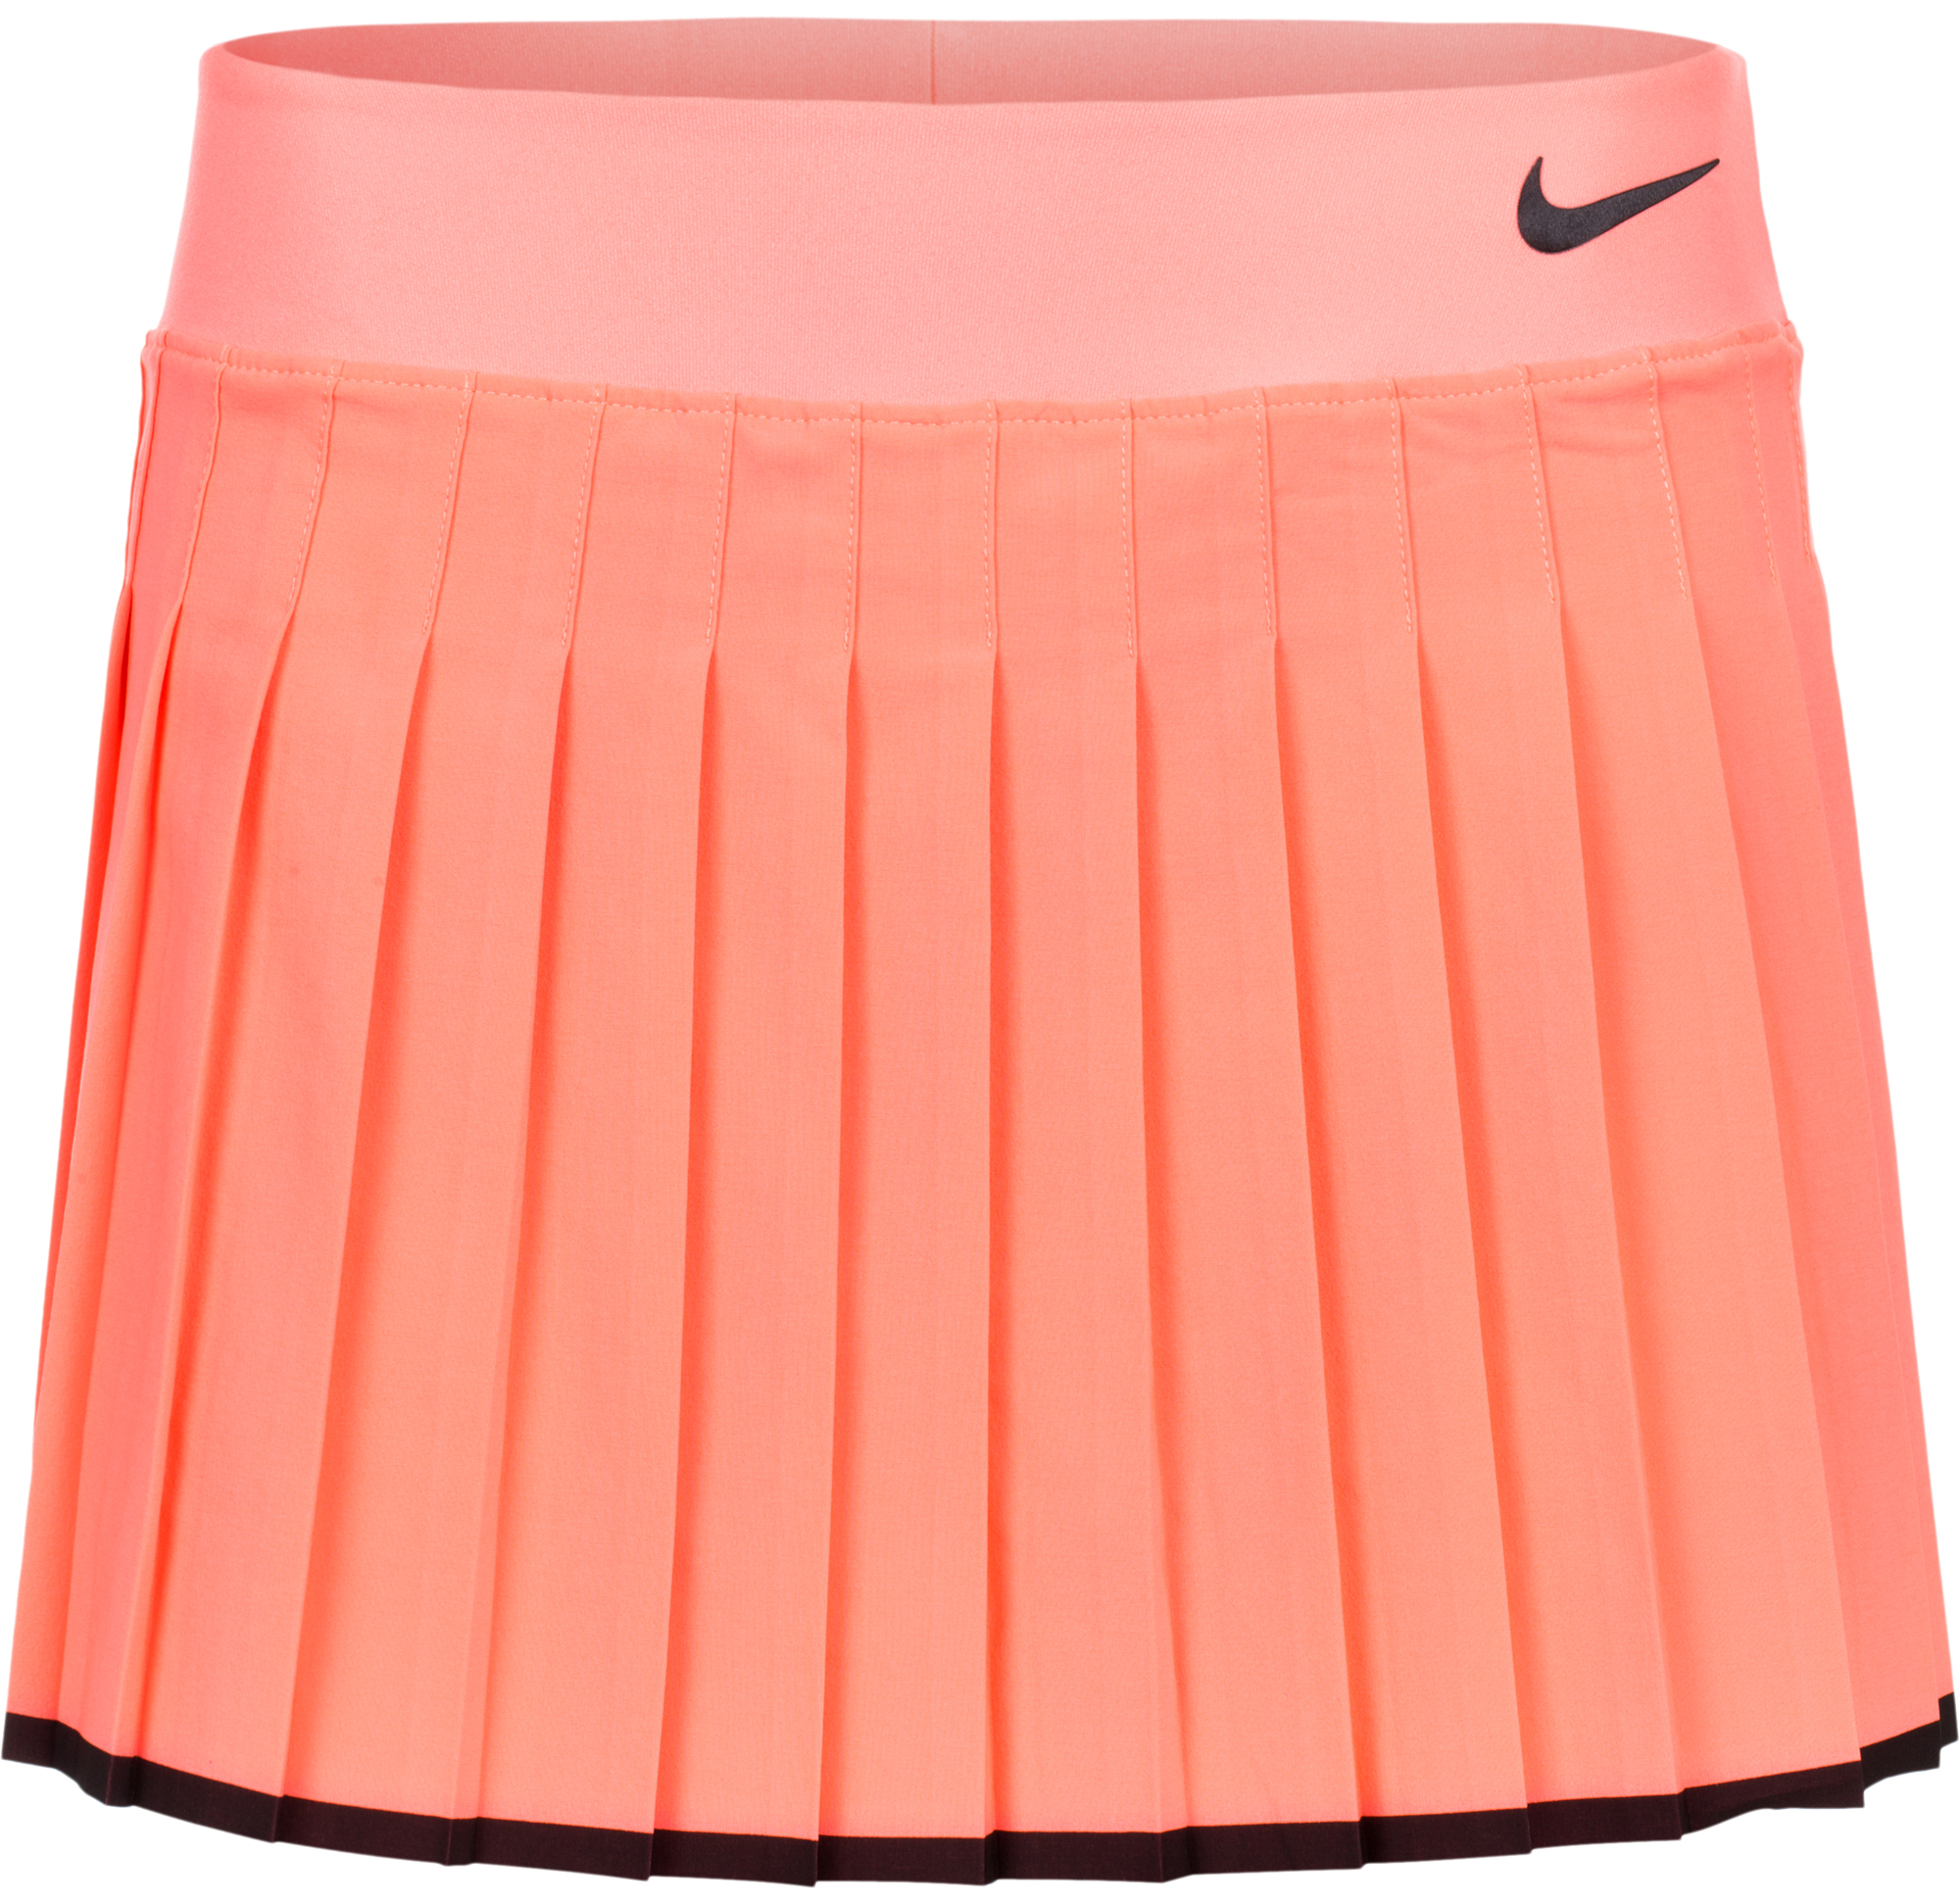 Nike Юбка-шорты для тенниса женская Nike Victory, размер 46-48 nike майка женская nike air размер 46 48